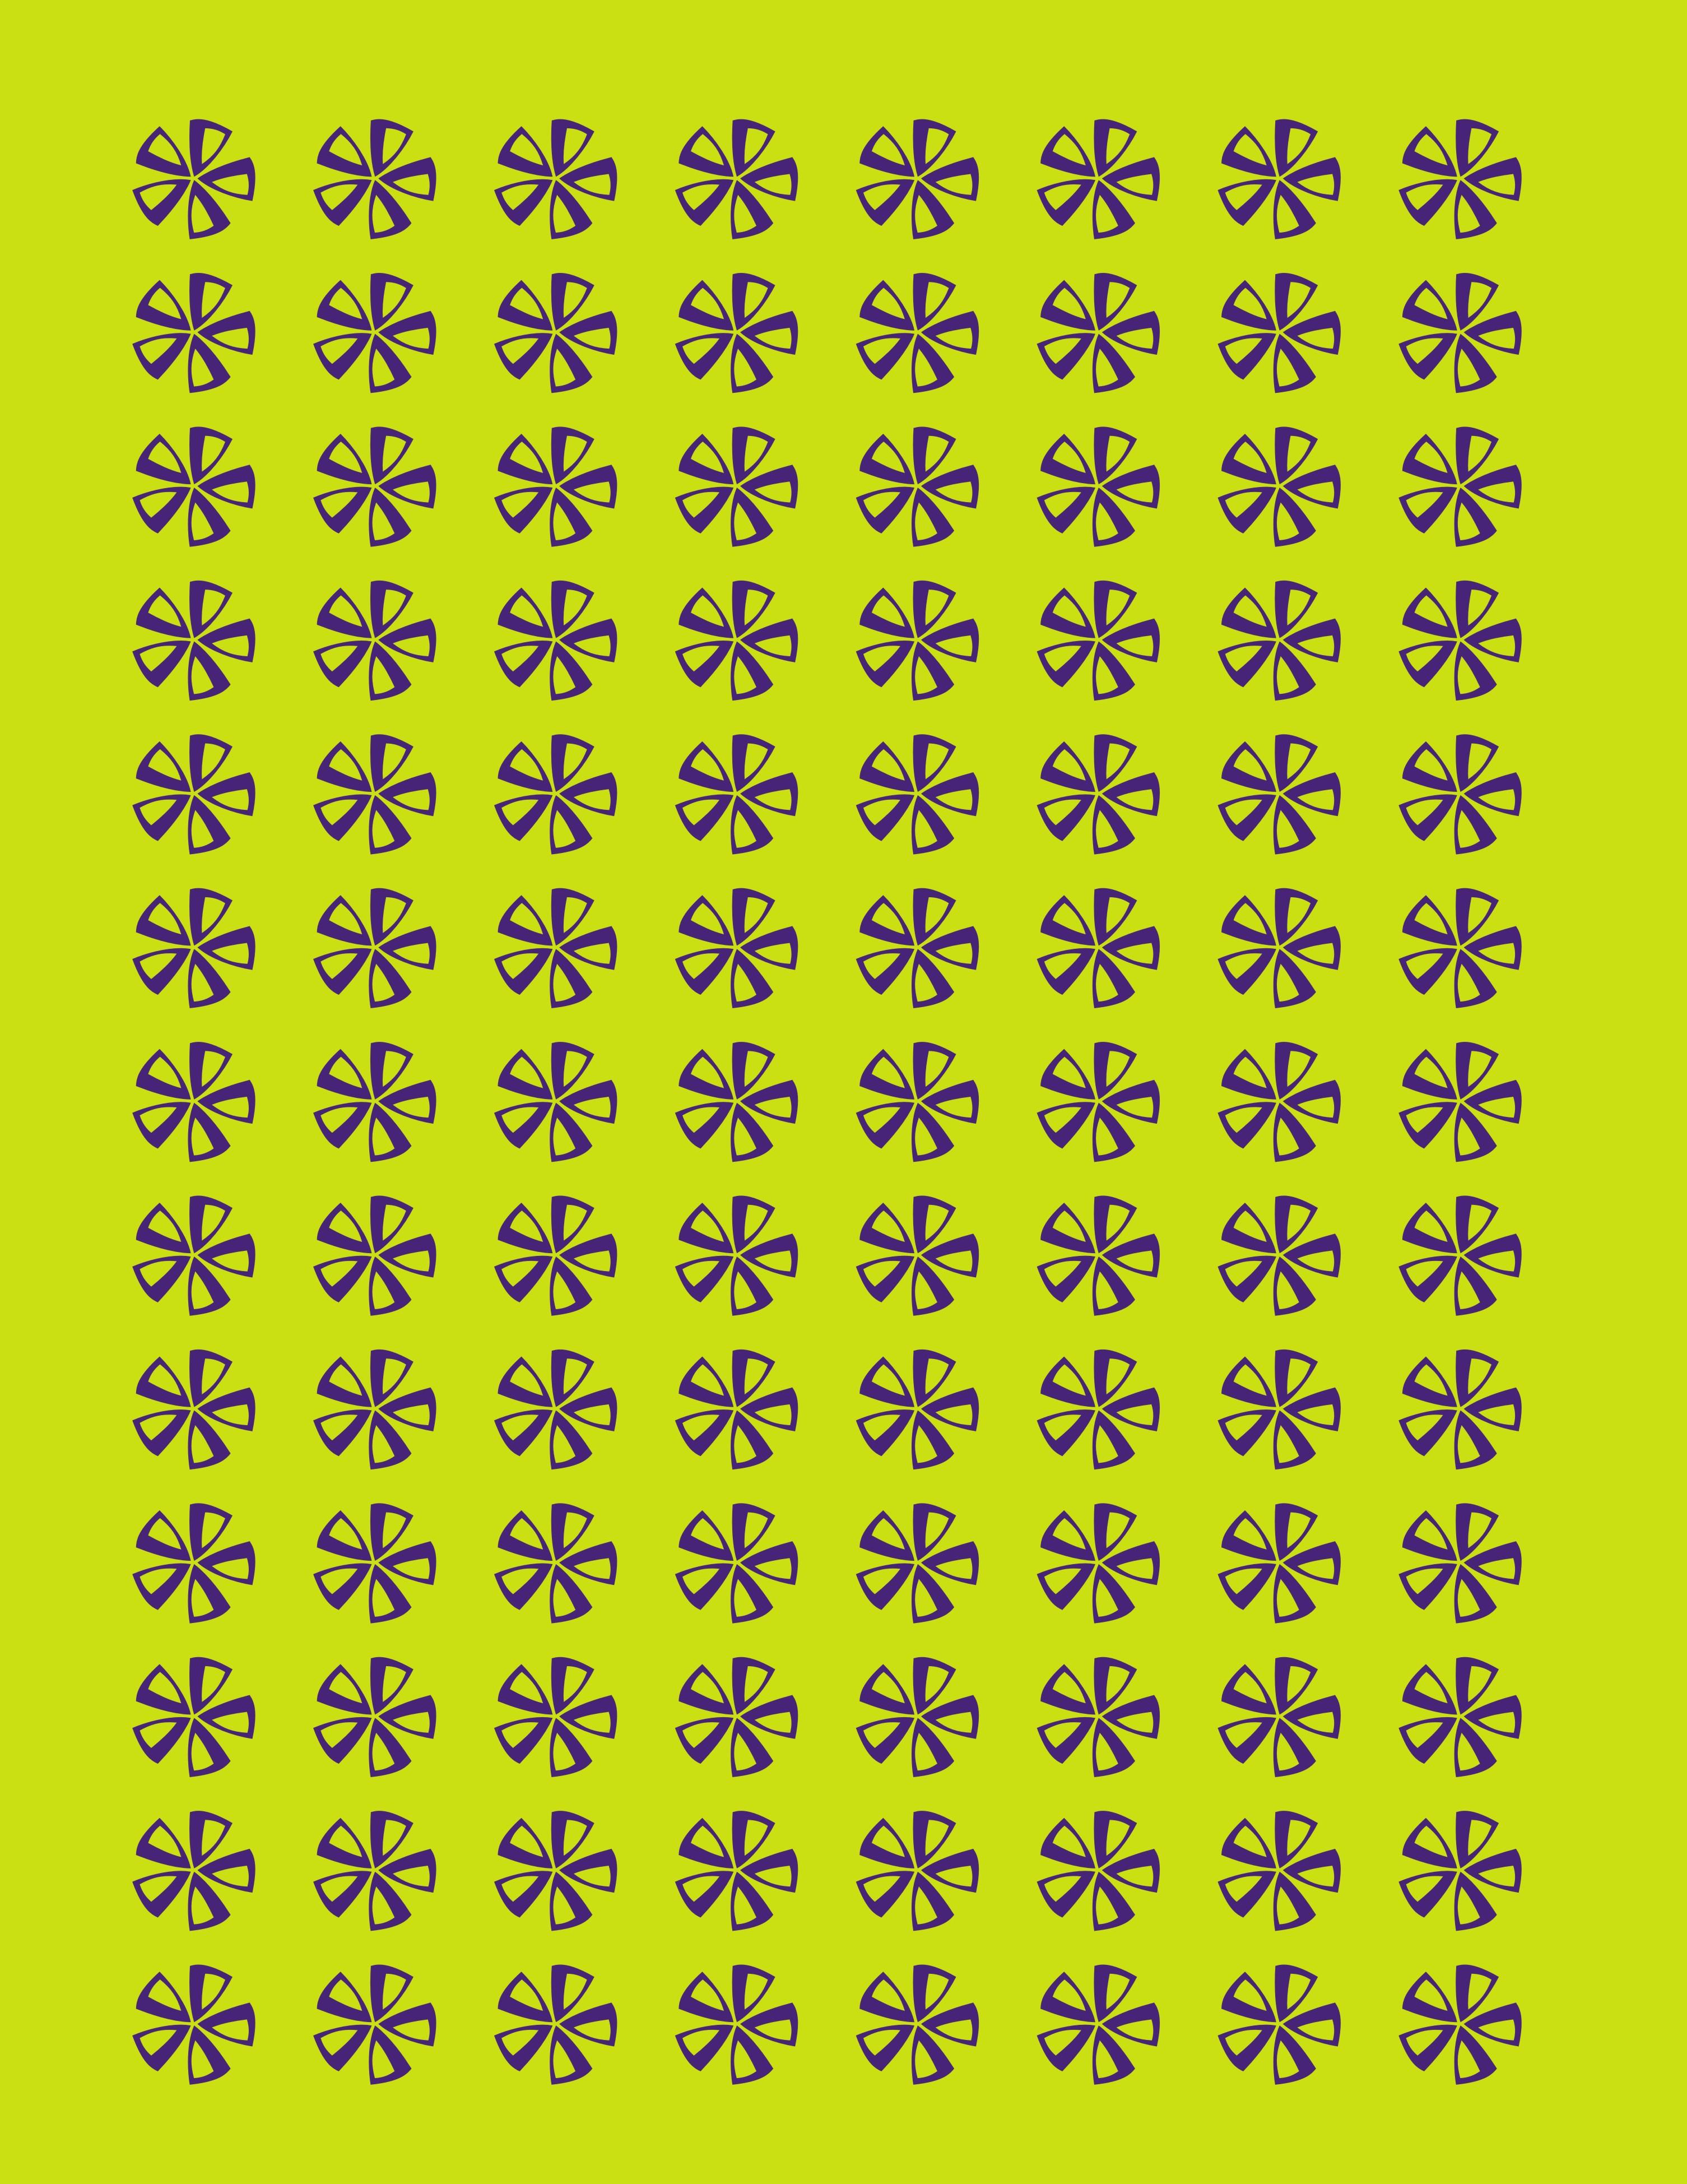 Pattern 3 Tling